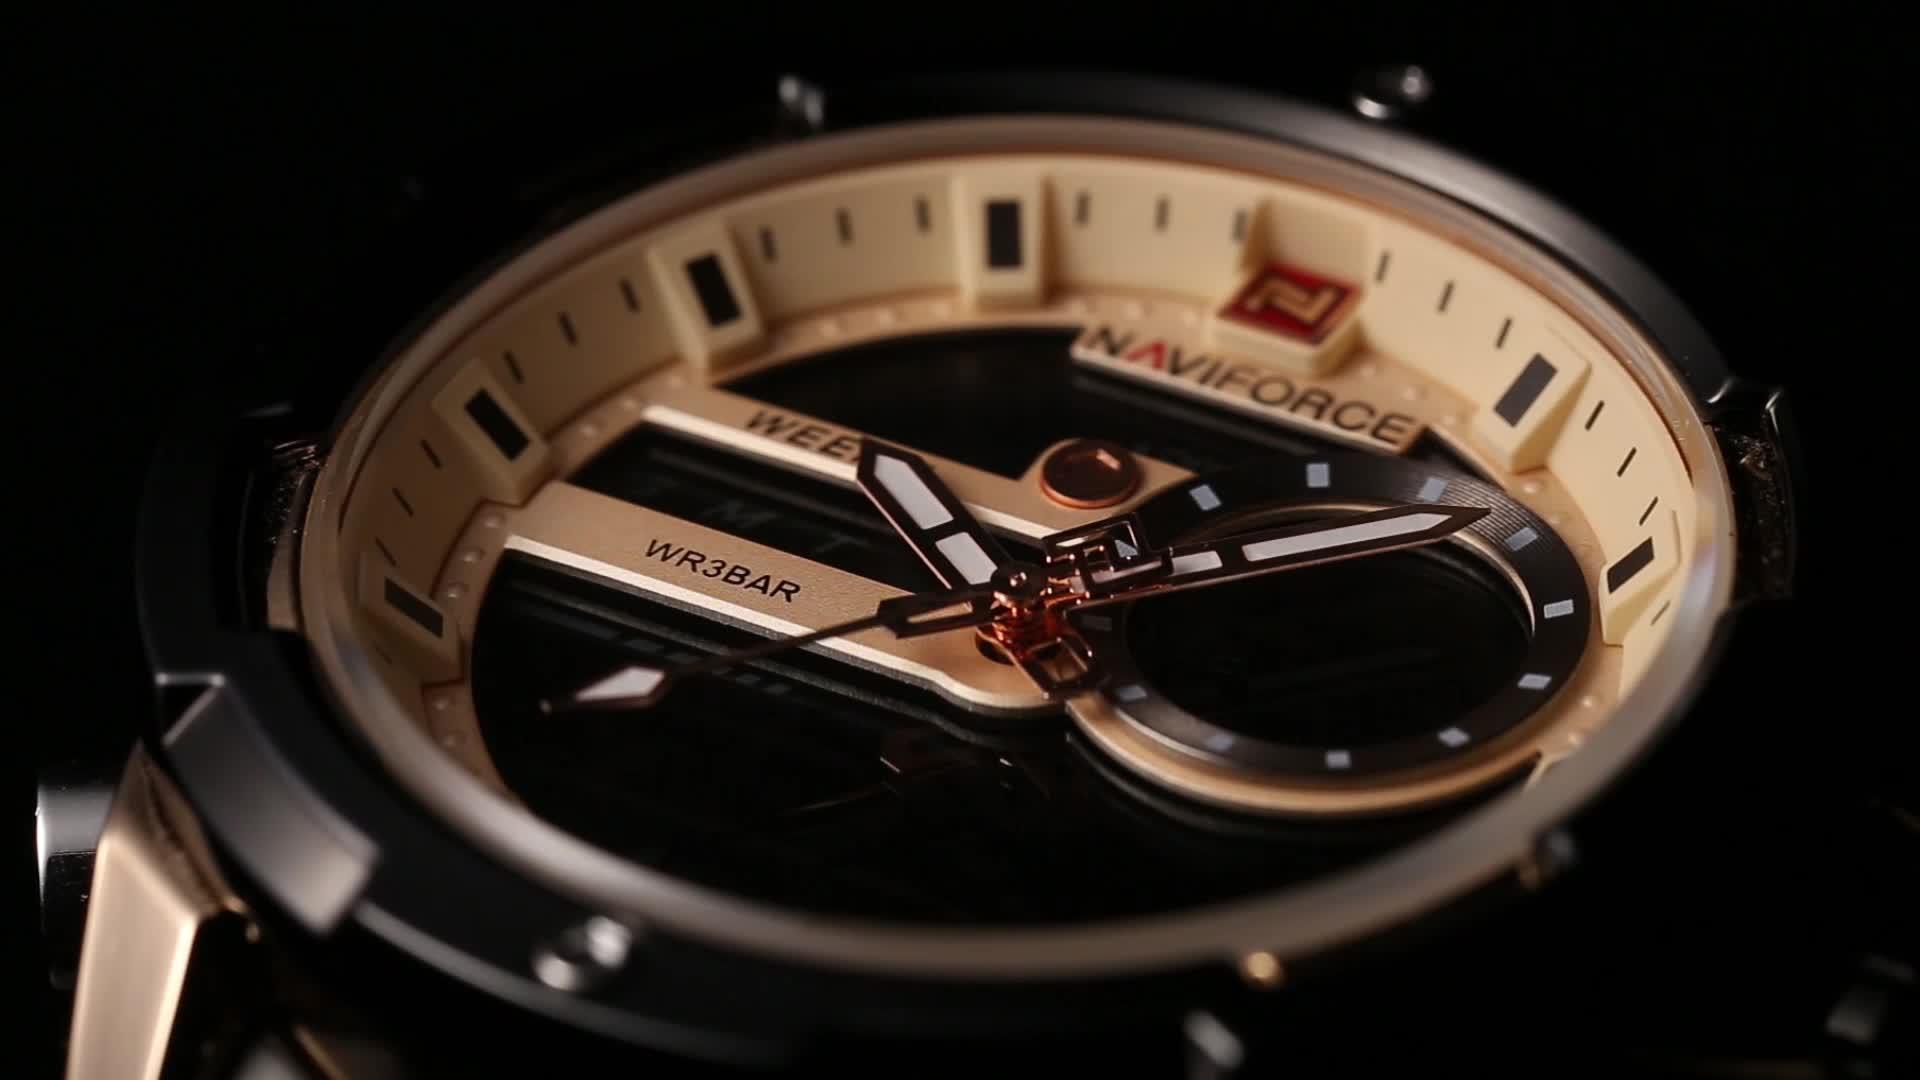 Naviforce 9120 japan movt quartz brand stainless steel watch